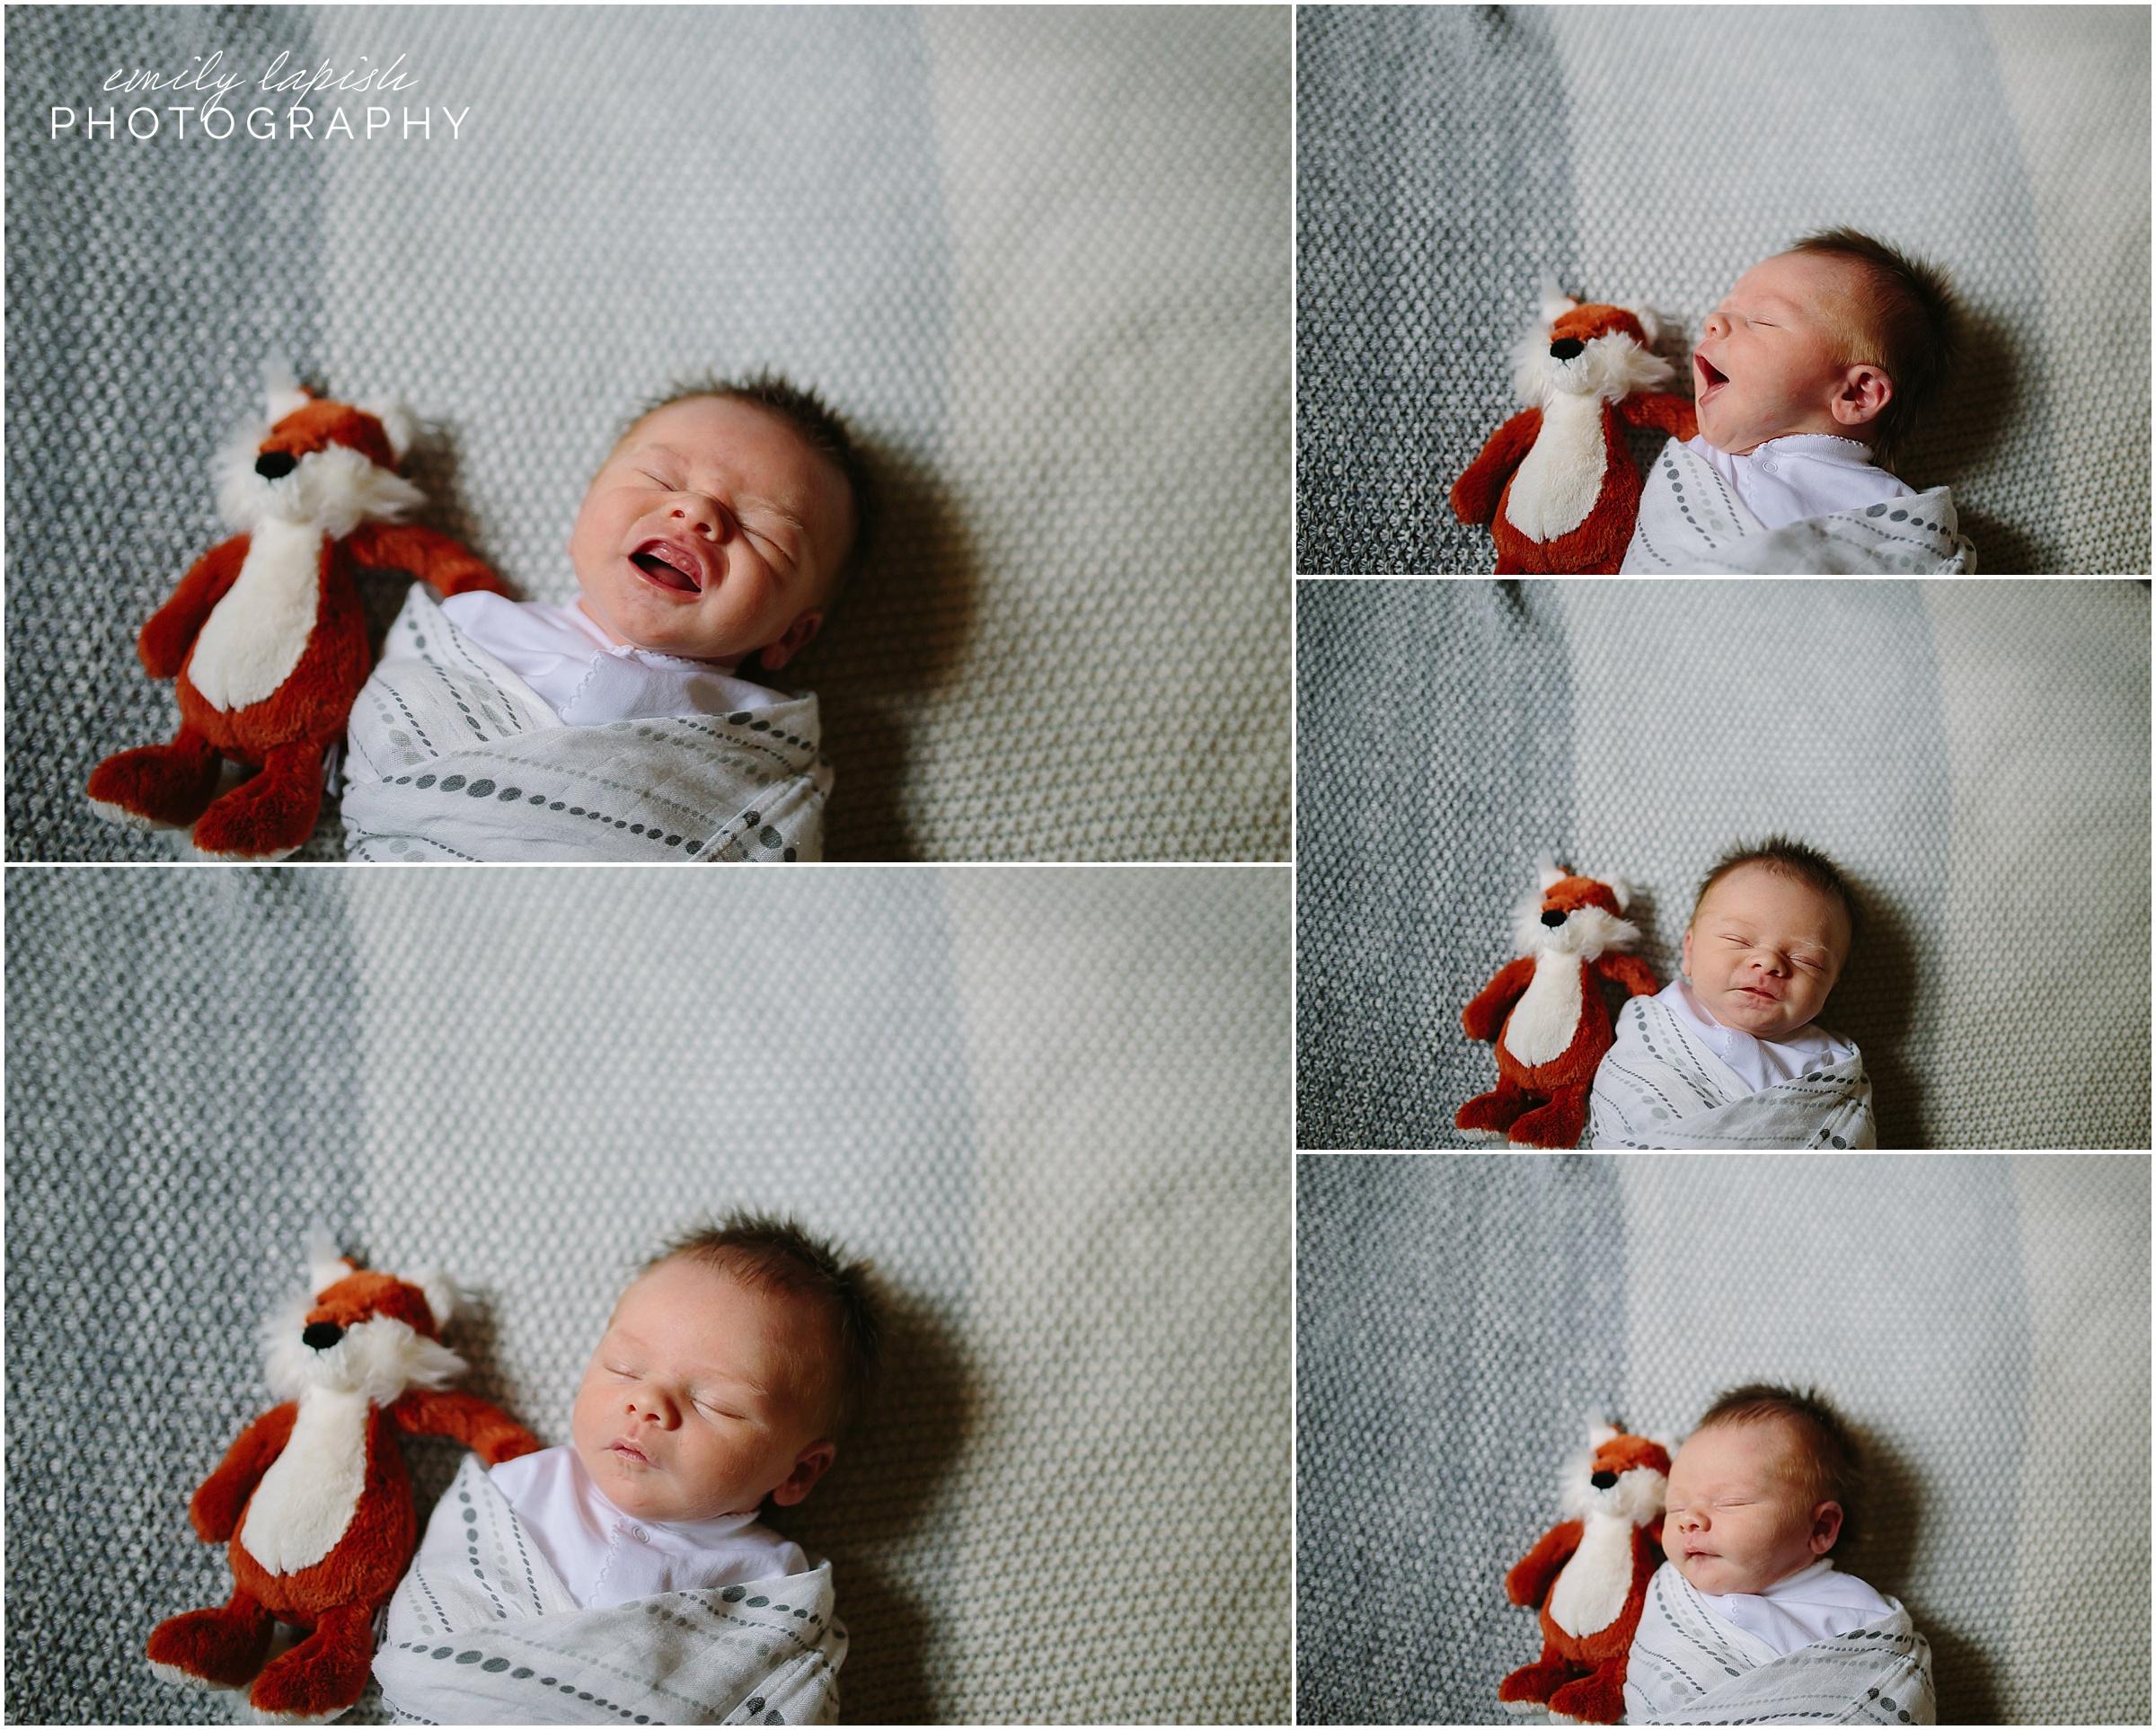 In home documentary newborn session by Emily Lapish Photography in Atlanta, GA